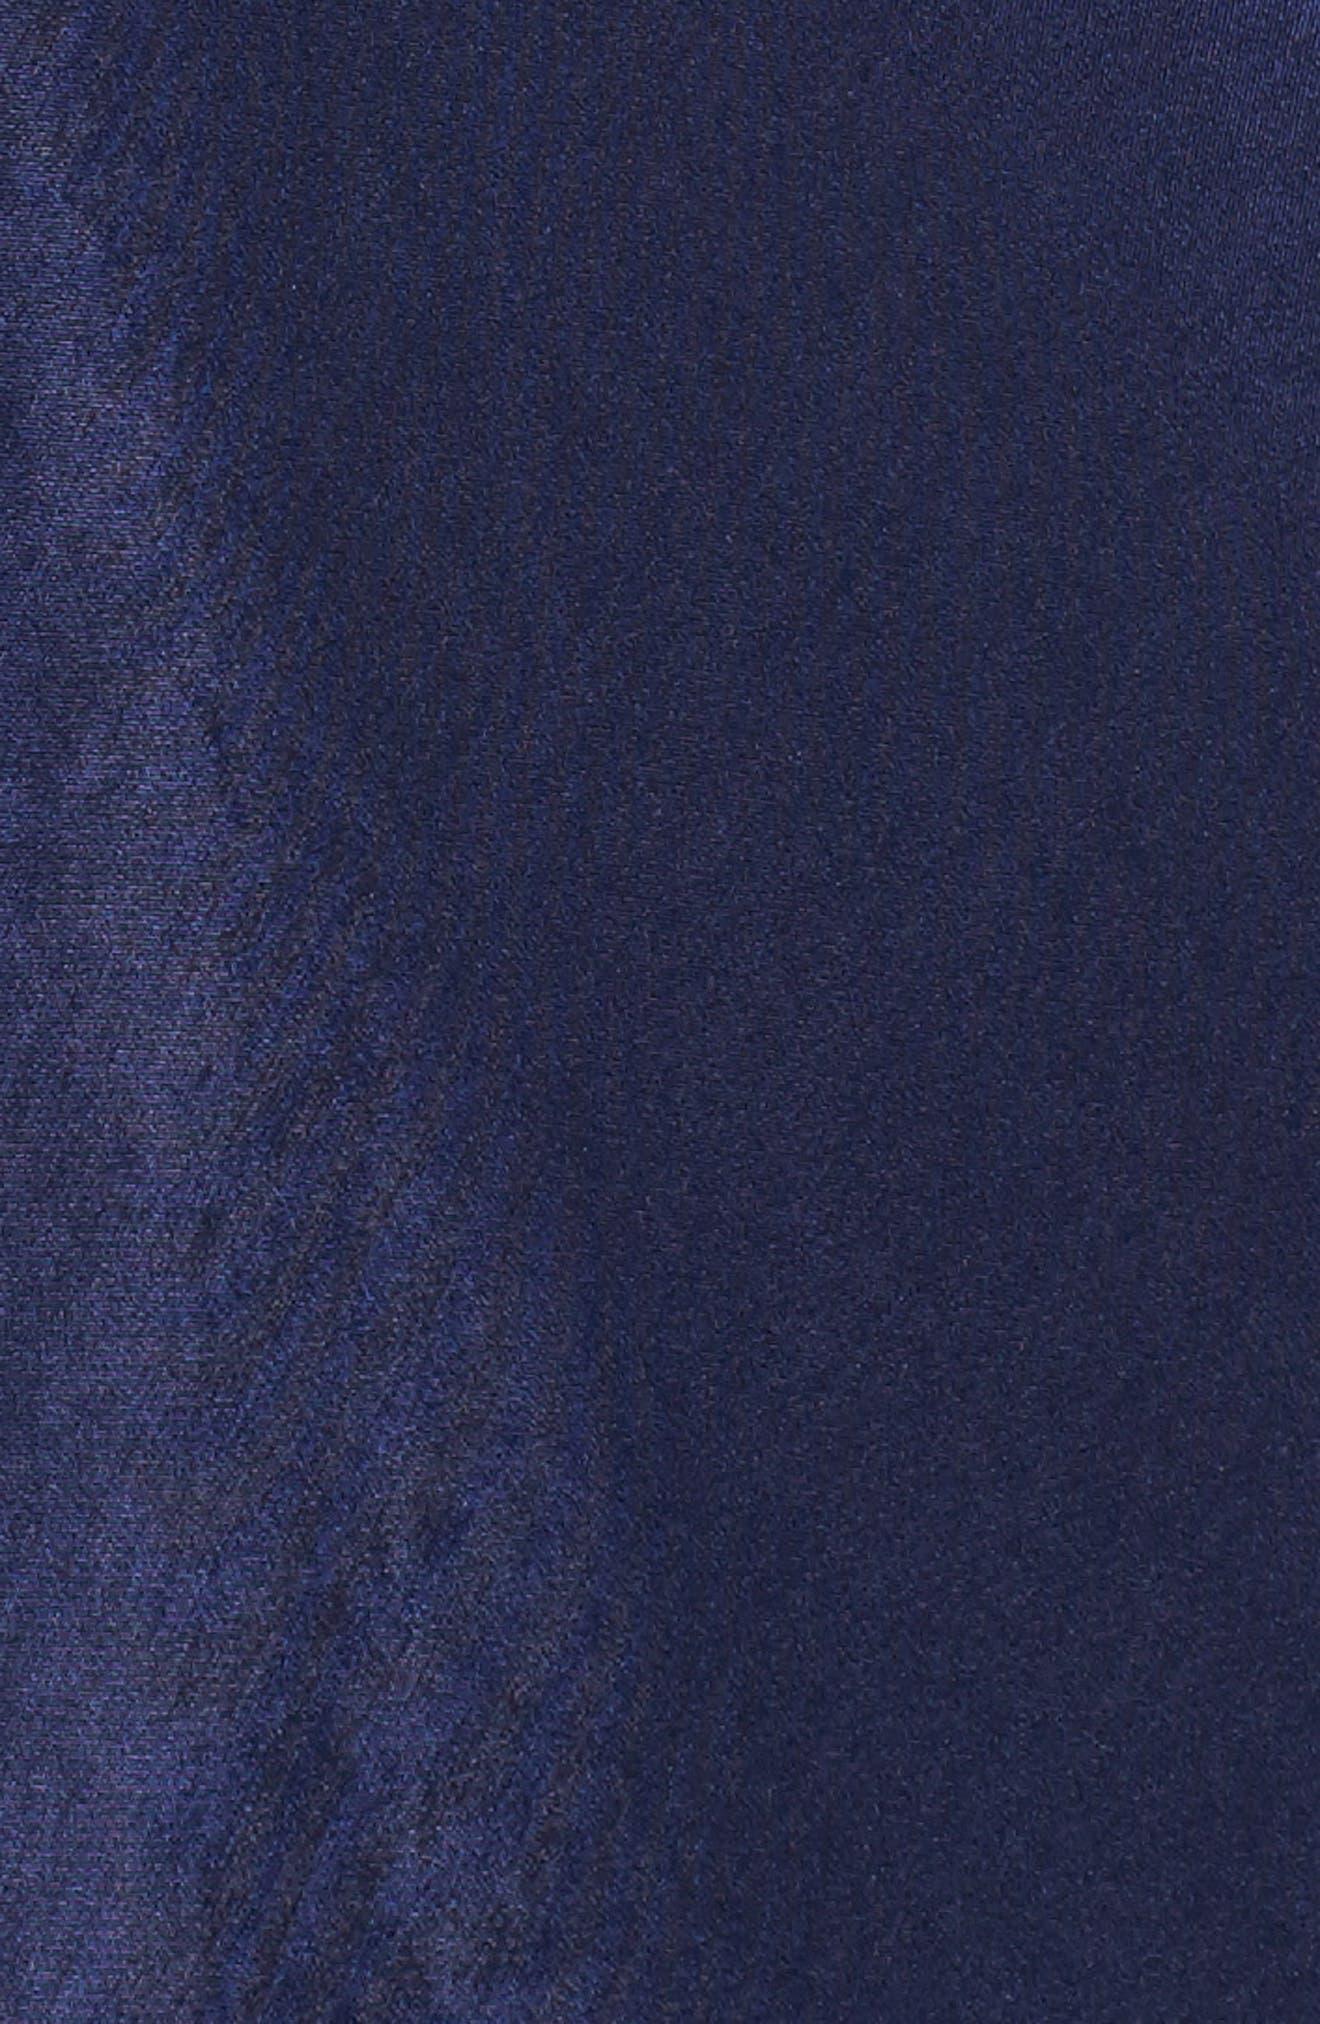 BP Satin Midi Skirt,                             Alternate thumbnail 5, color,                             410